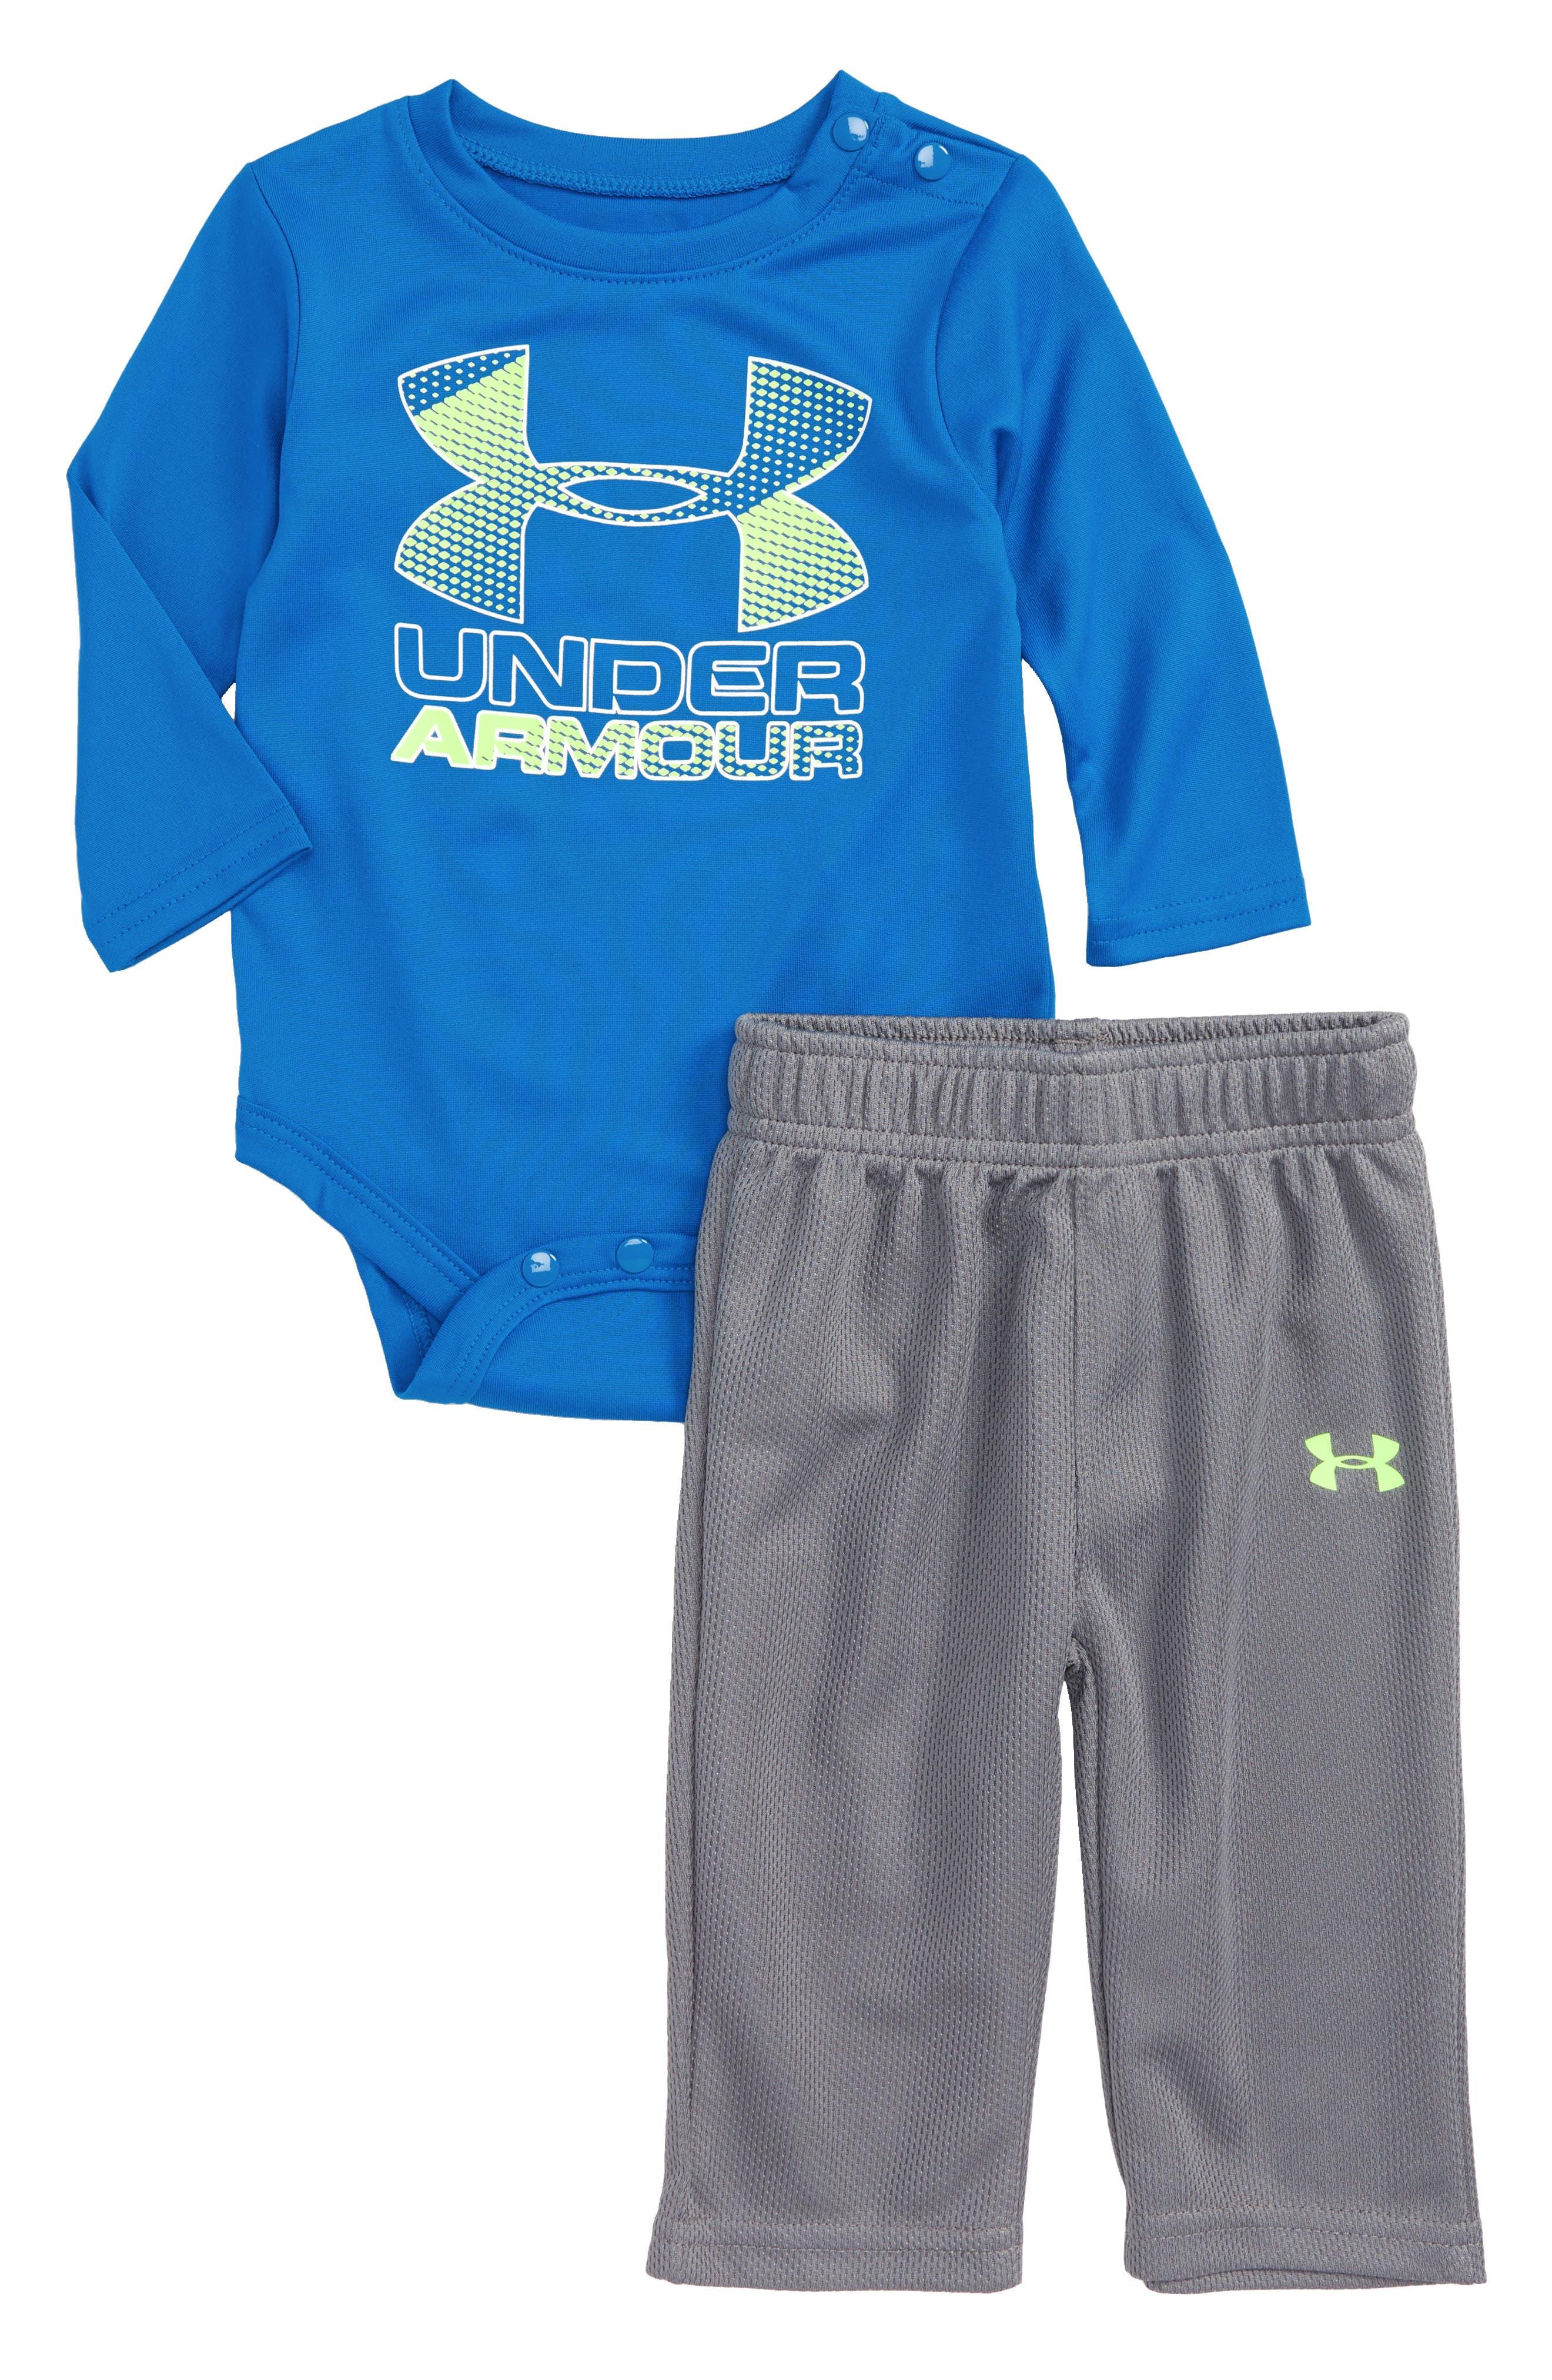 Under Armour Hybrid Logo Graphic Bodysuit & Pants Set (Baby Boys)